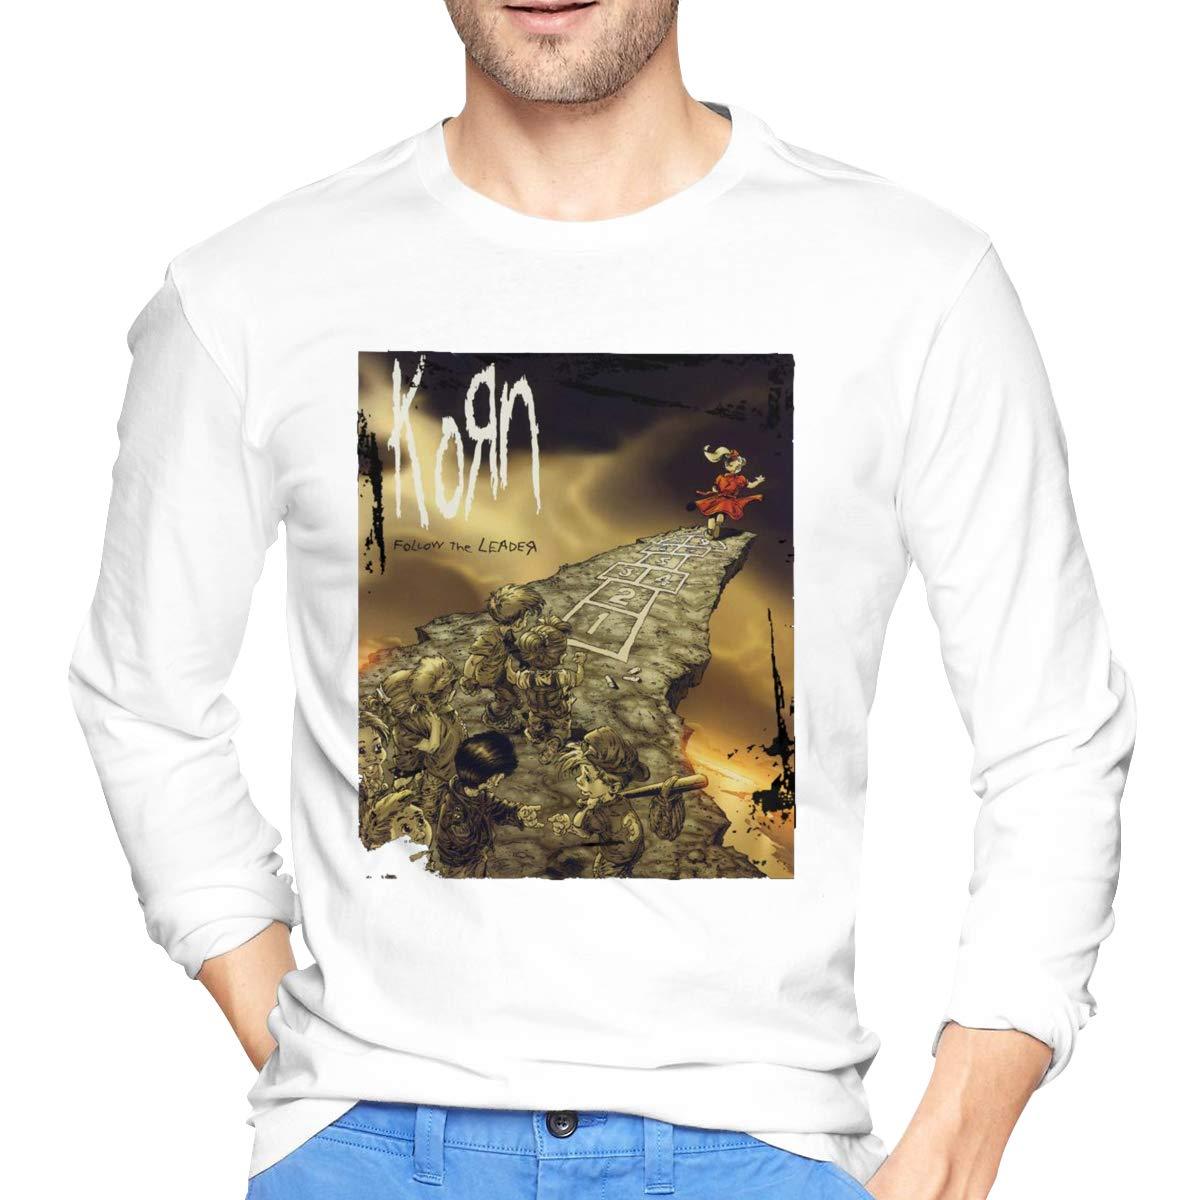 S Korn Follow The Leader Tshirt Round Neck Fashion Tee Black